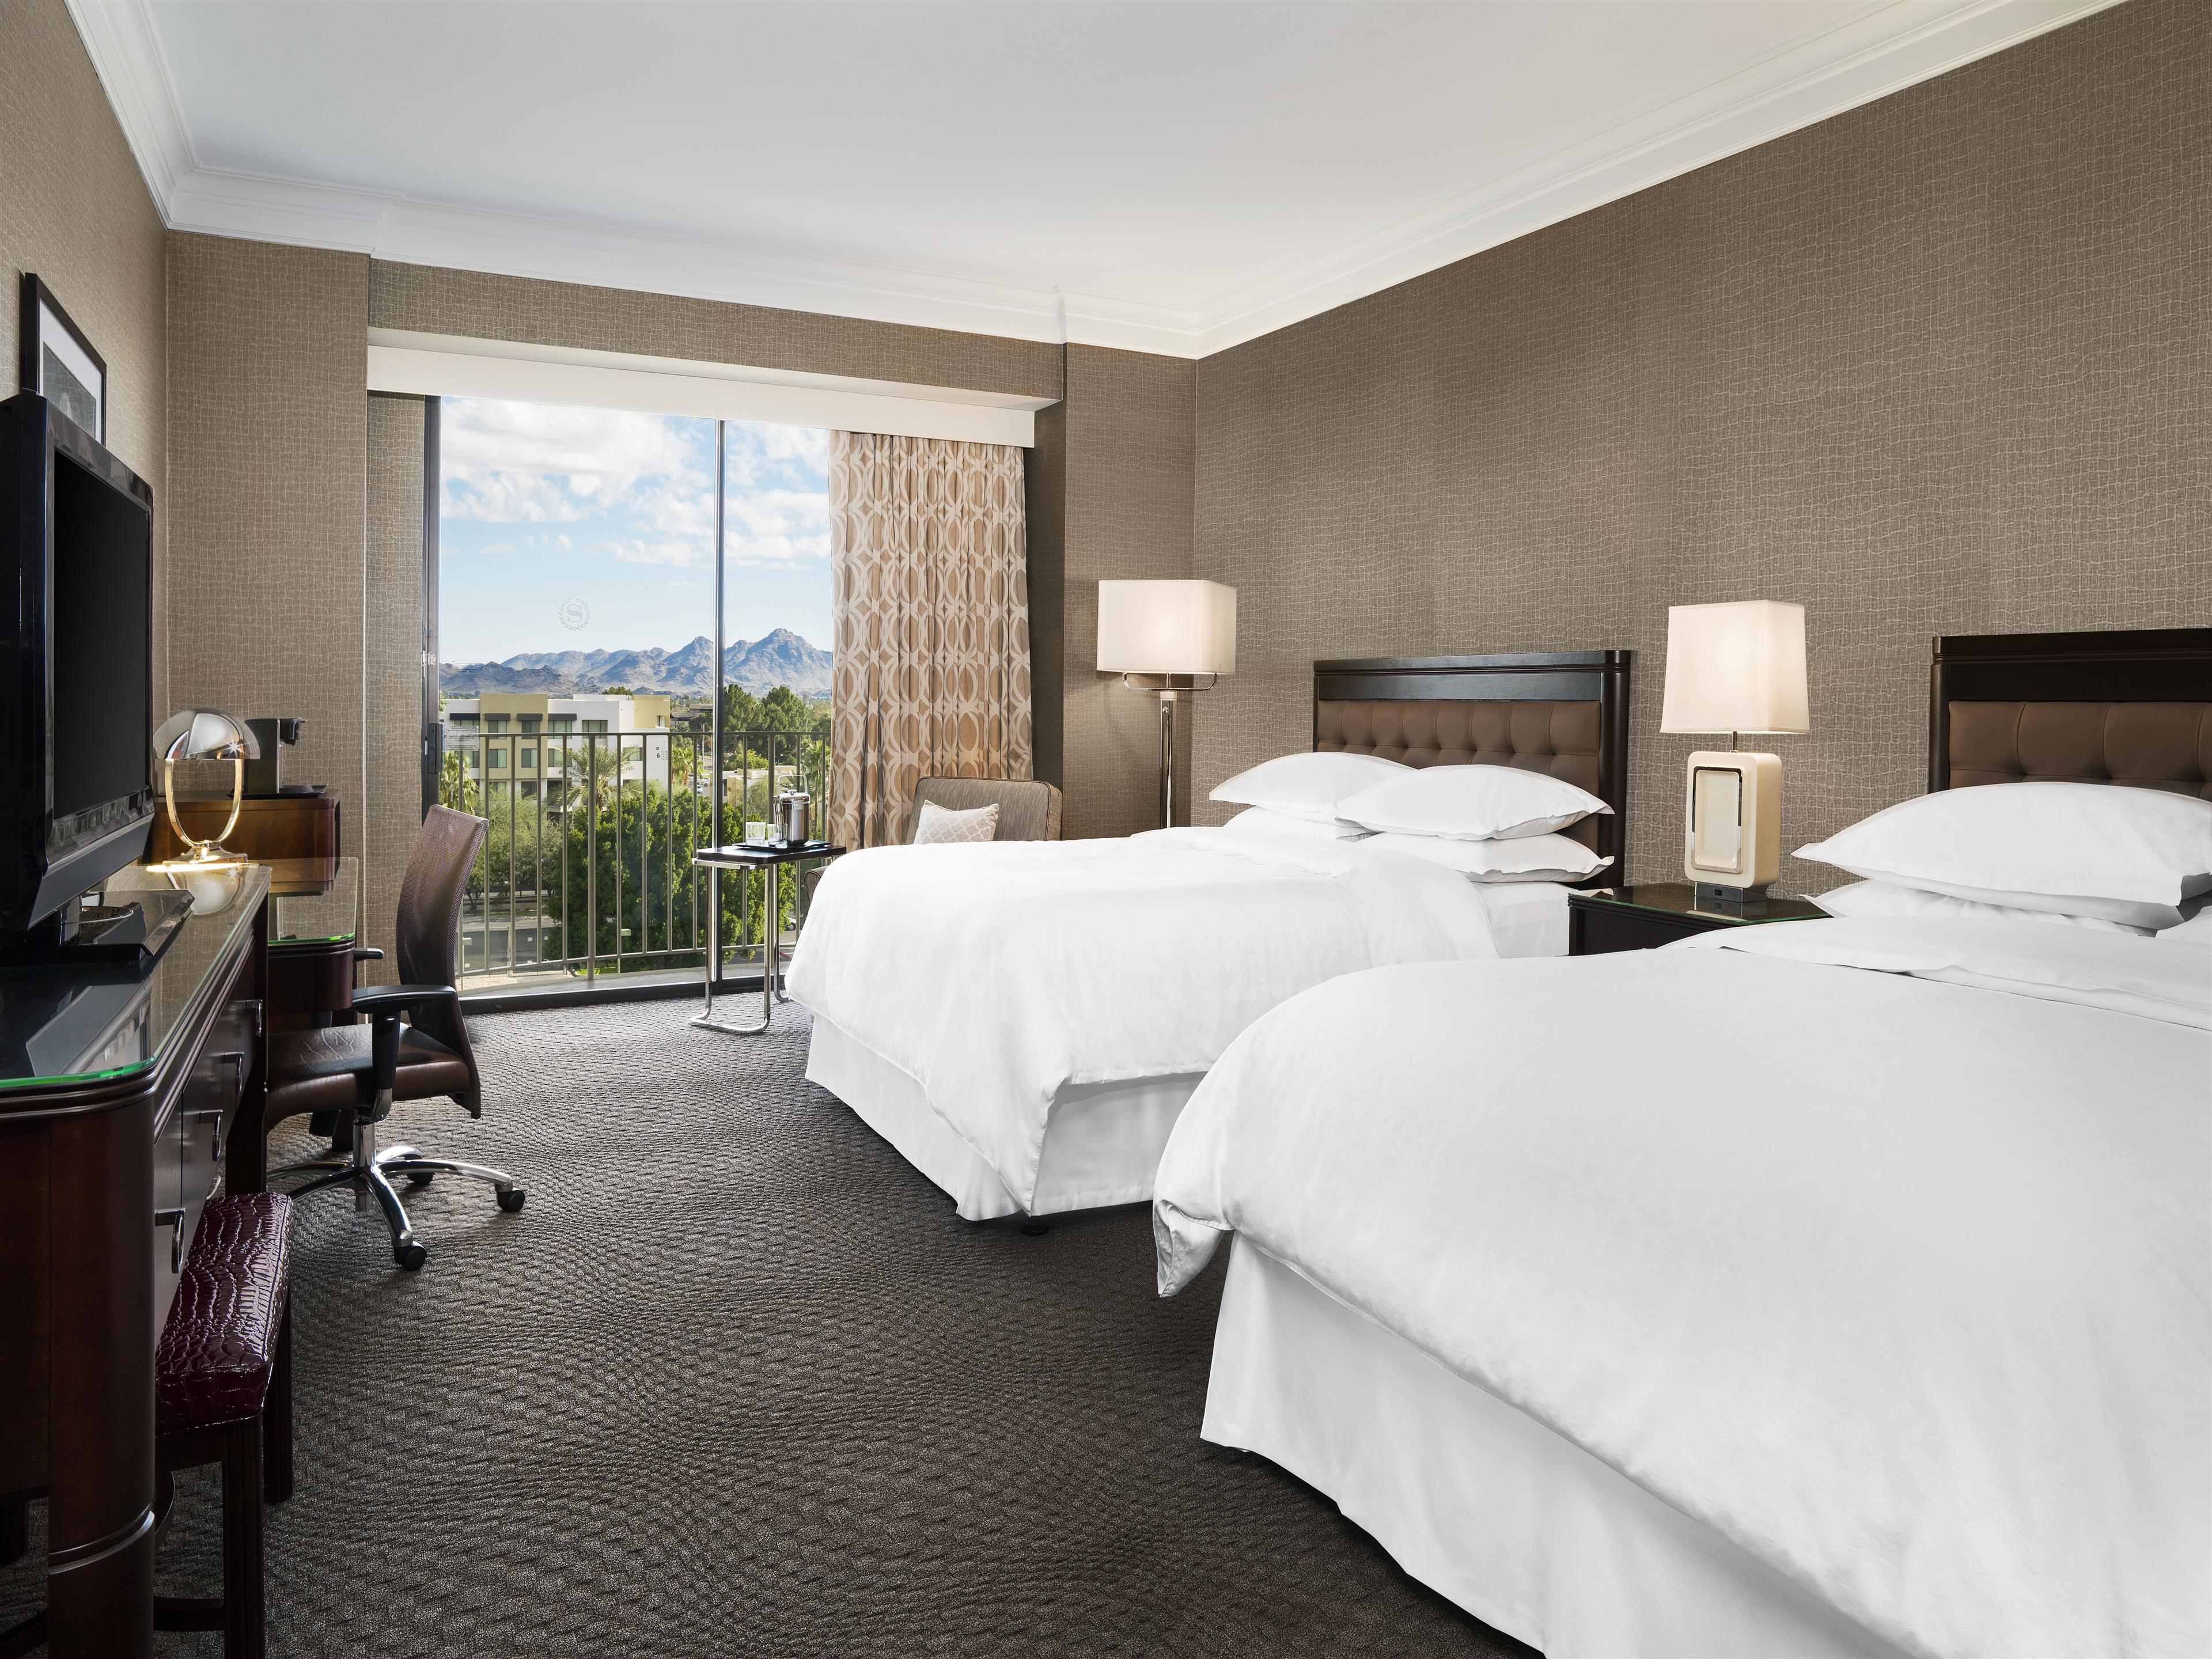 Sheraton Crescent Hotel image 1